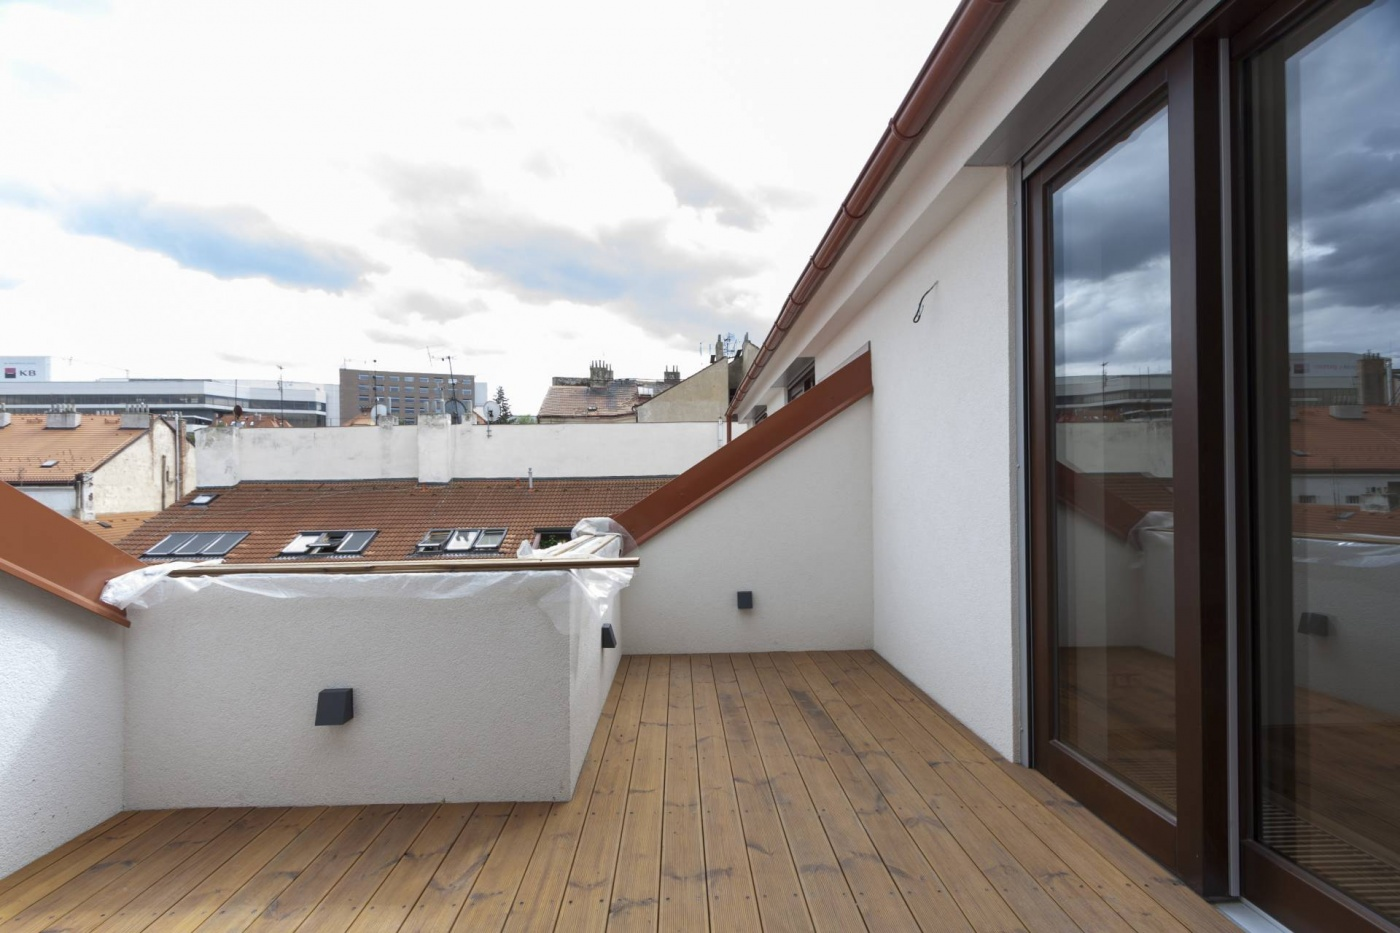 Půdní byt 3+kk, plocha 109 m², ulice Lumírova, Praha 2 - Vyšehrad | 17